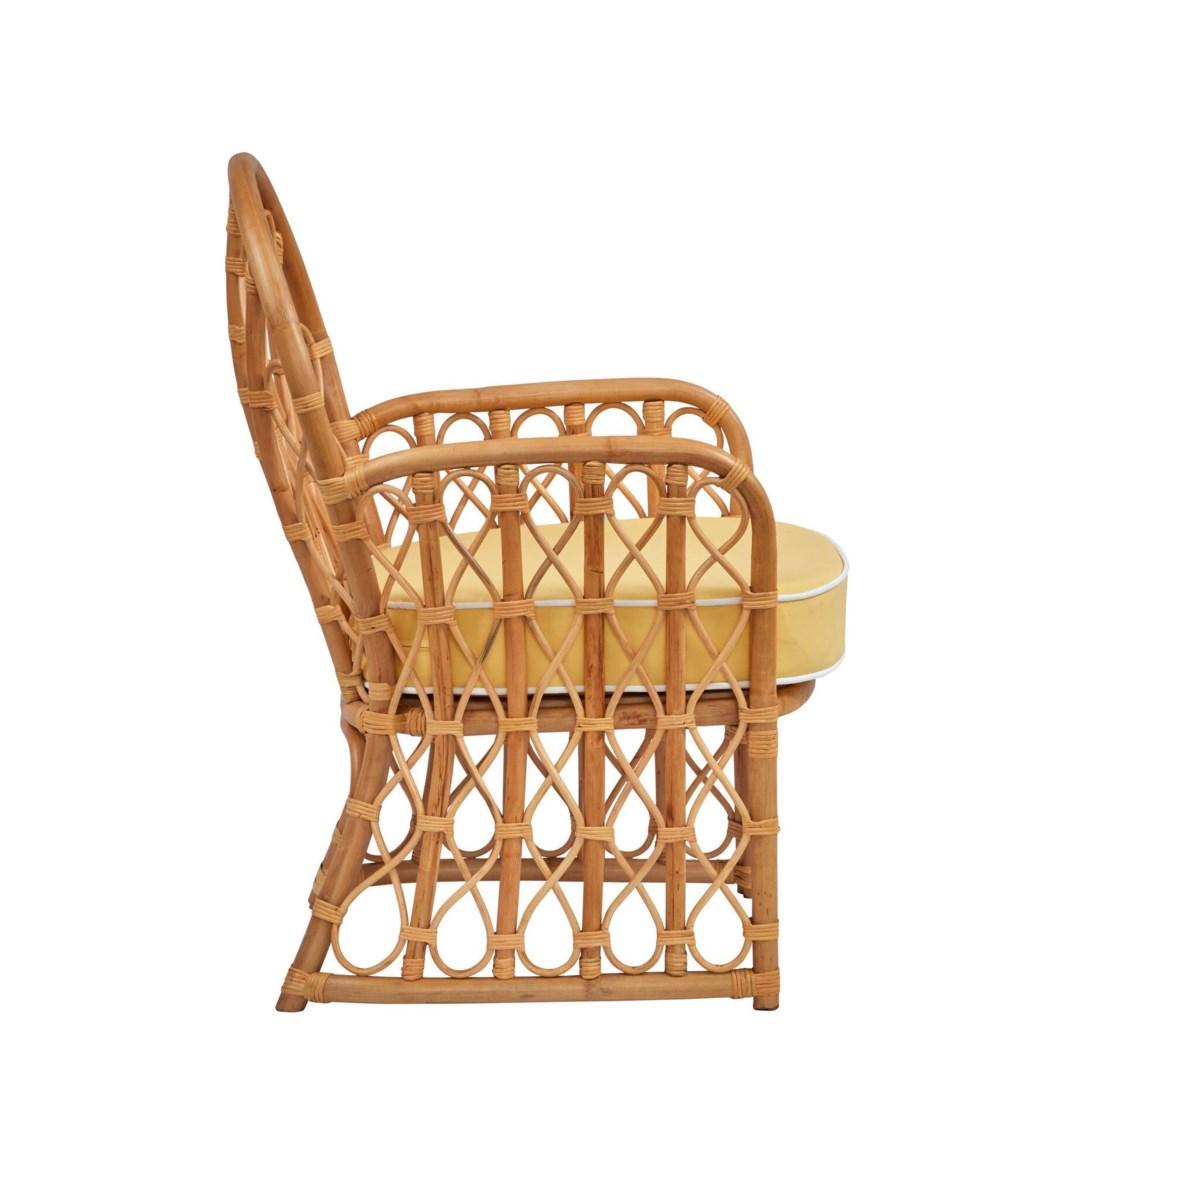 Mahogany Bay Arm Chair Rattan Frame - Natural Cushion Color - Cream